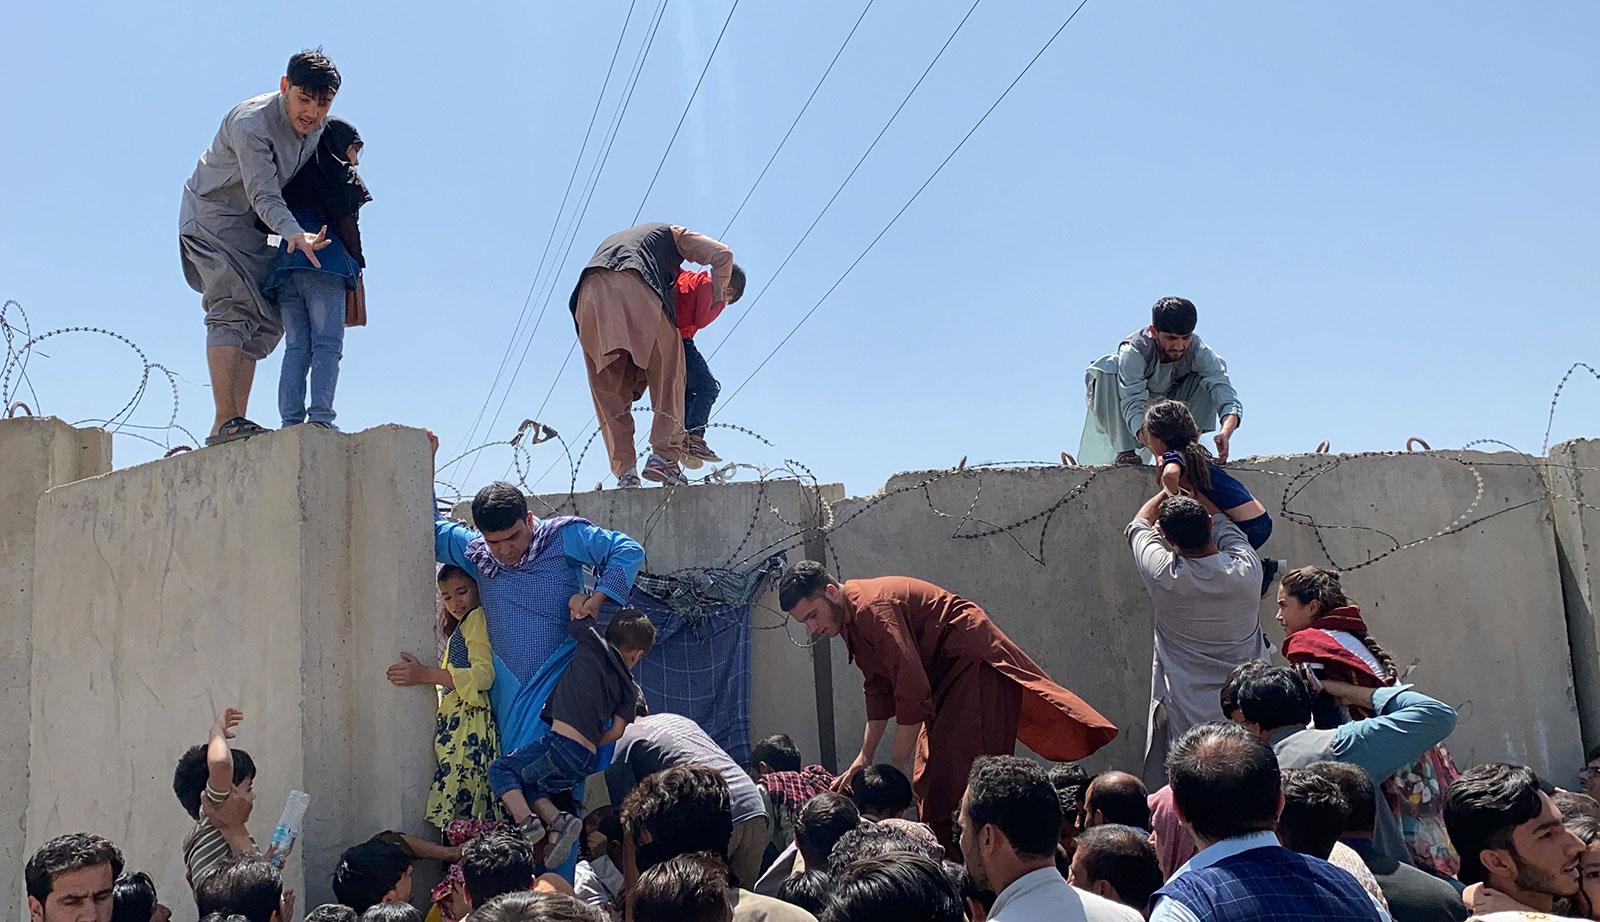 People struggle to cross the boundary wall of Kabul's Hamid Karzai internationalairport on August 16.